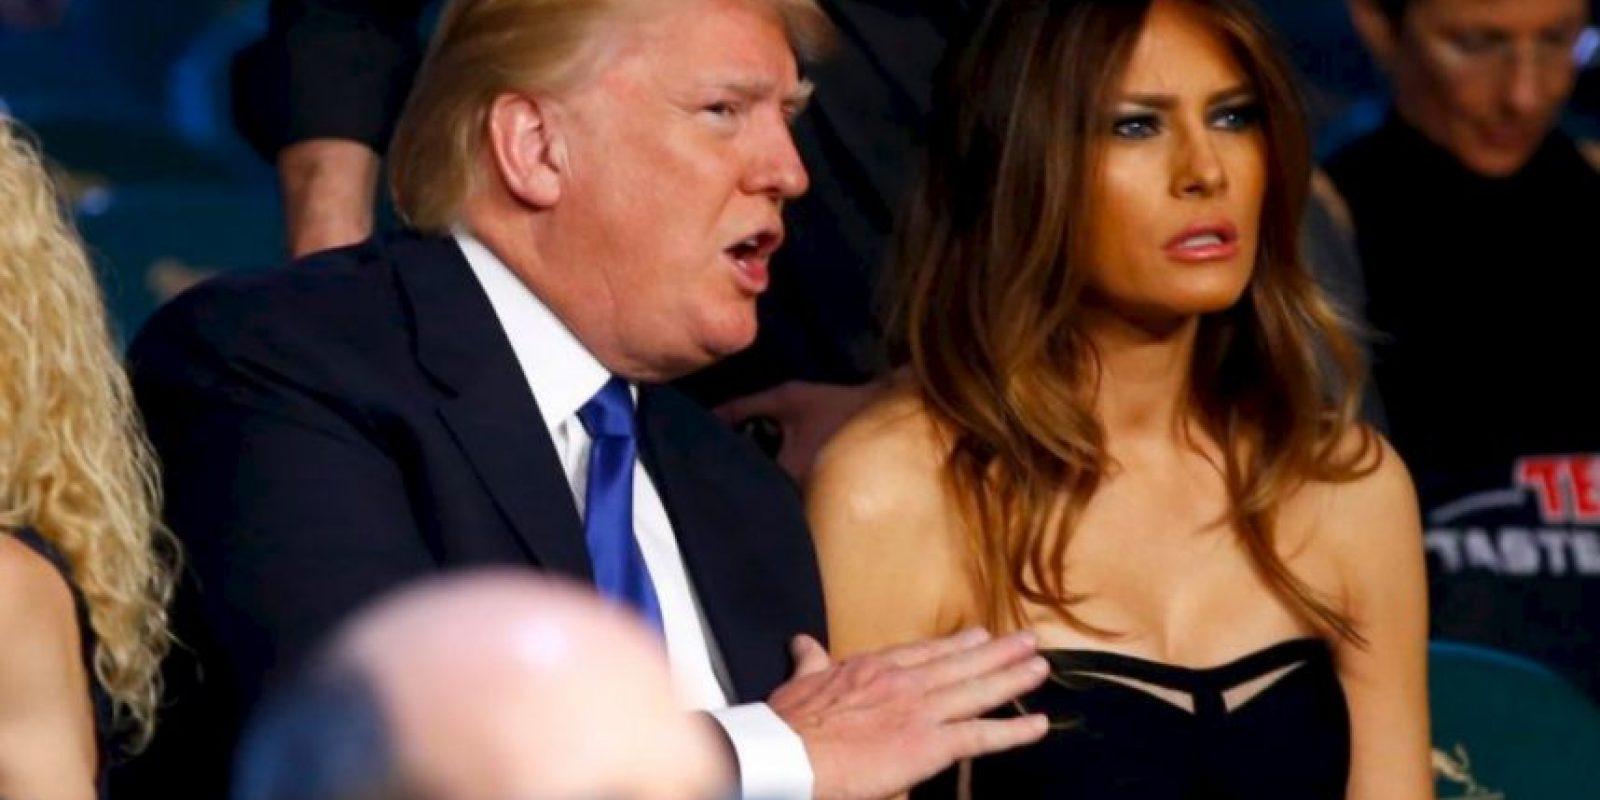 l magnate Donald Trump y su esposa, Melania Trump F Foto:Getty Images